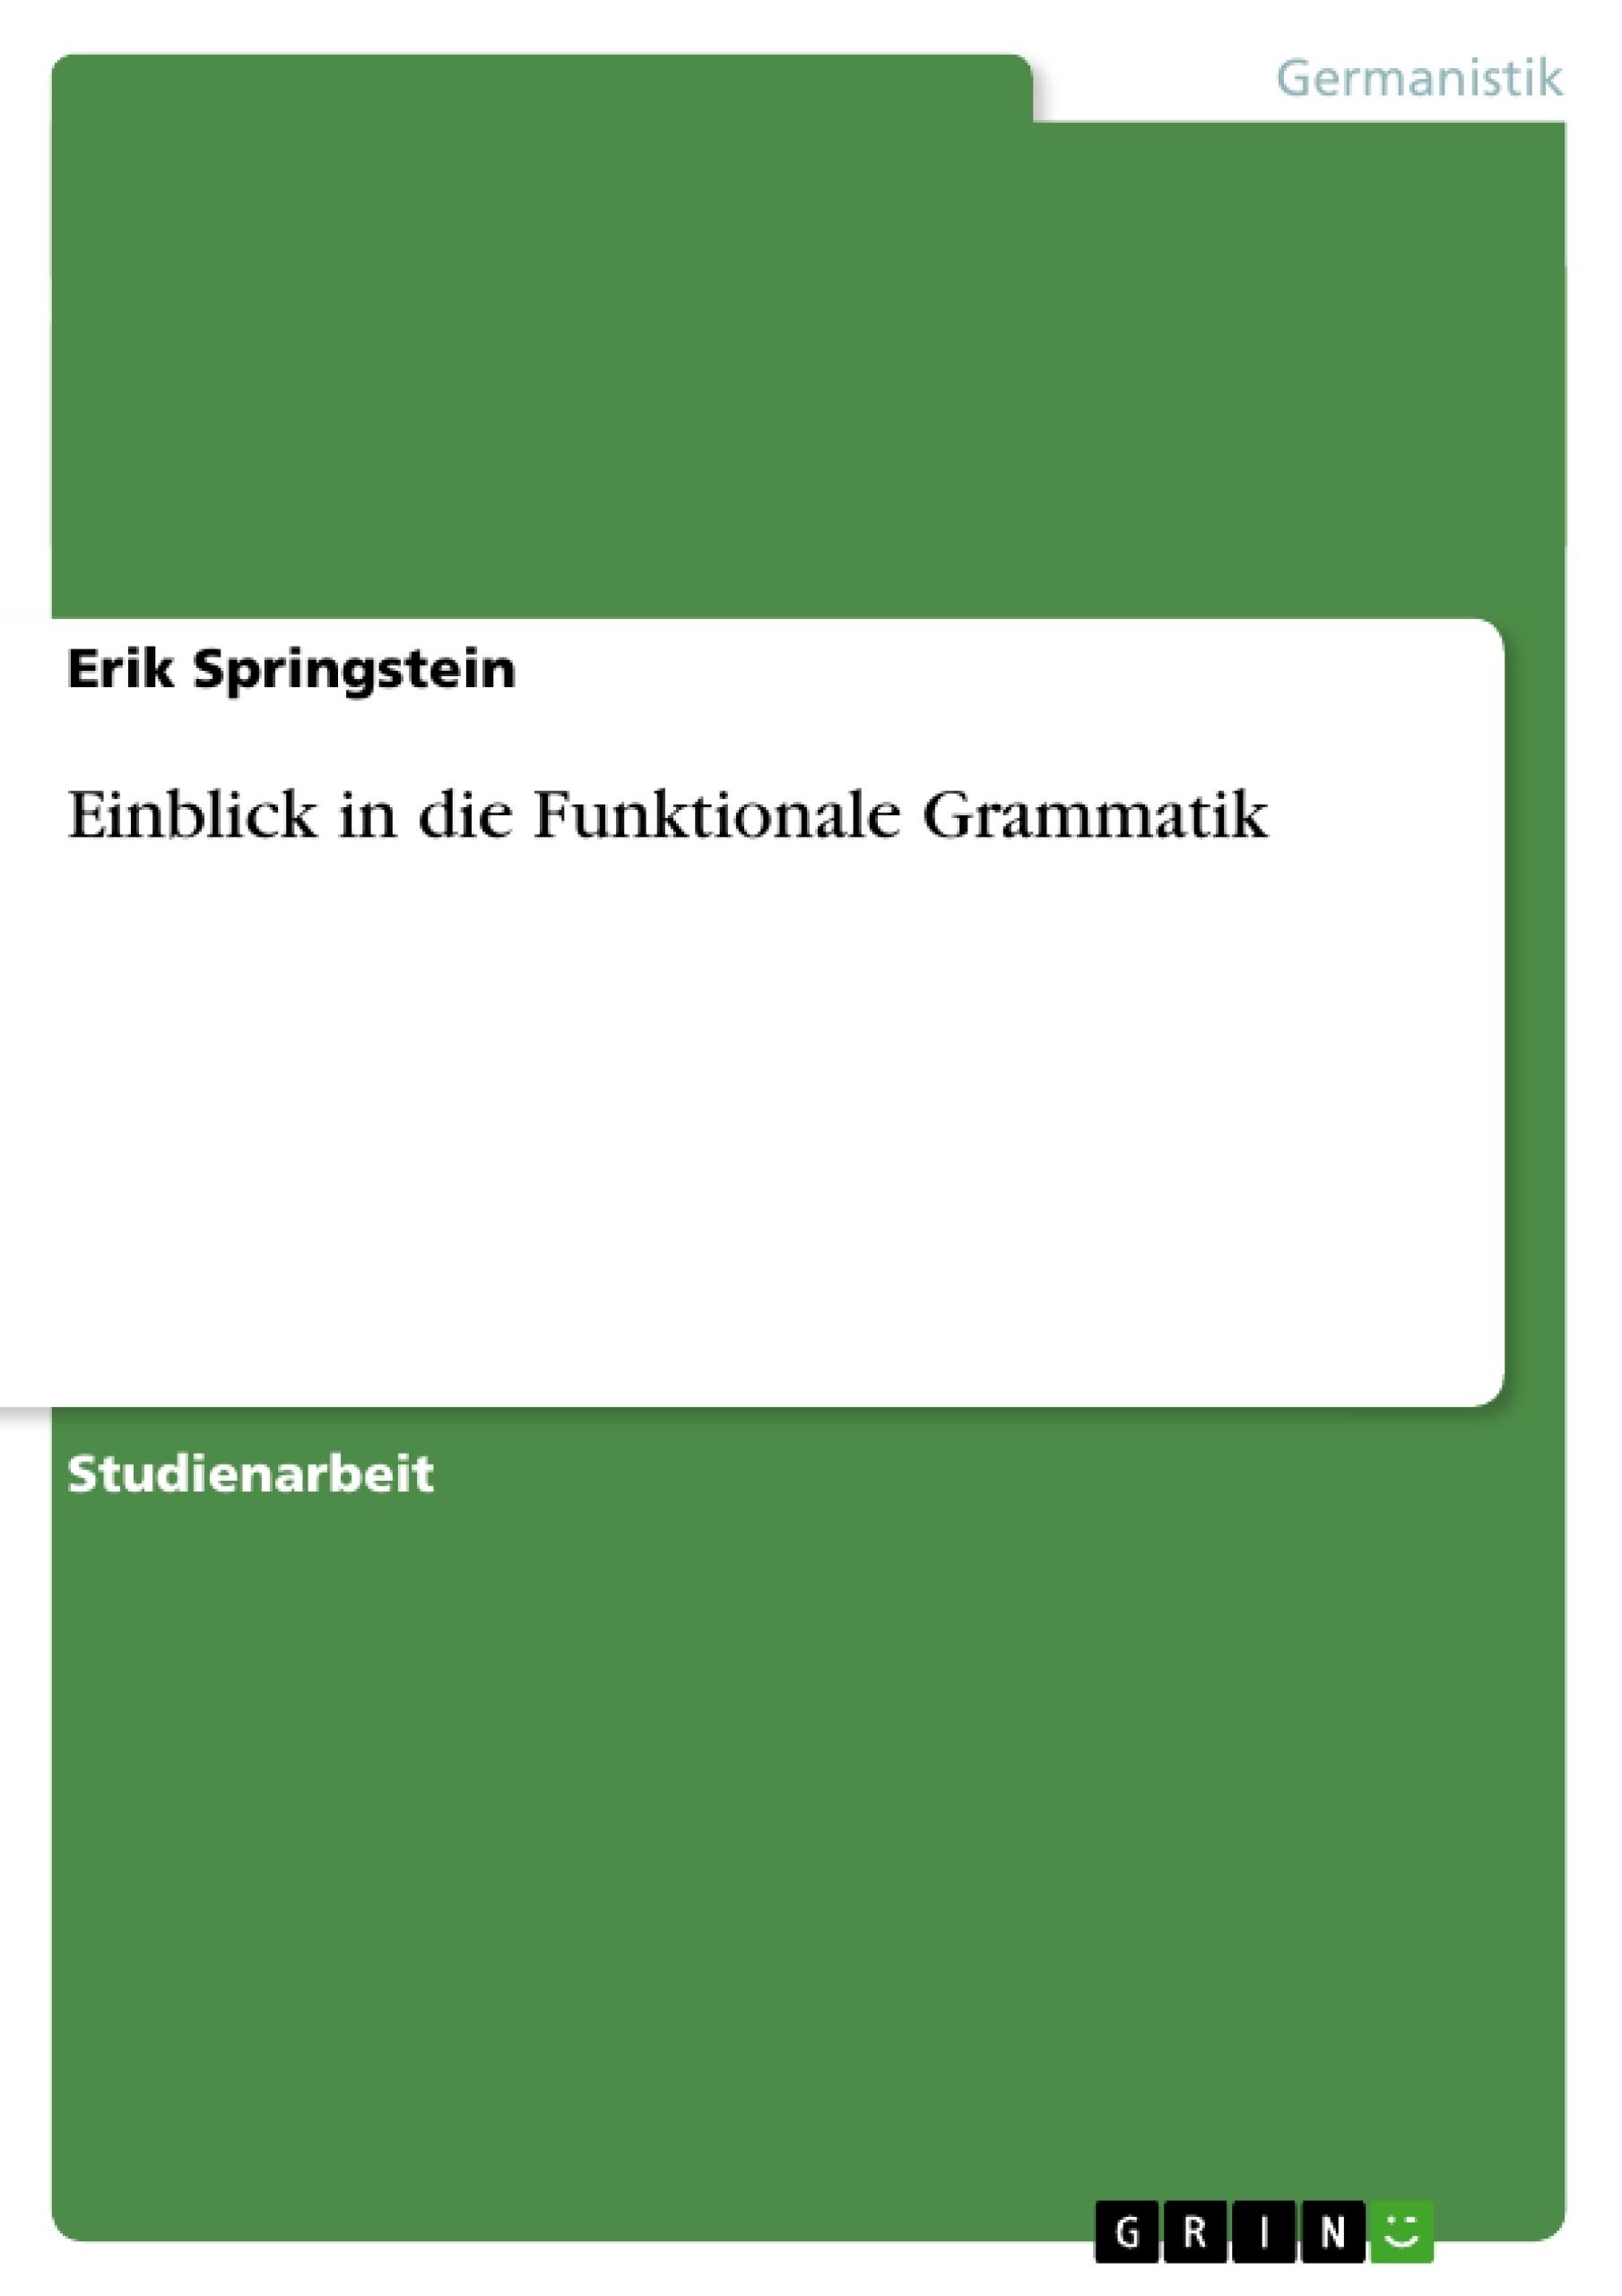 Titel: Einblick in die Funktionale Grammatik